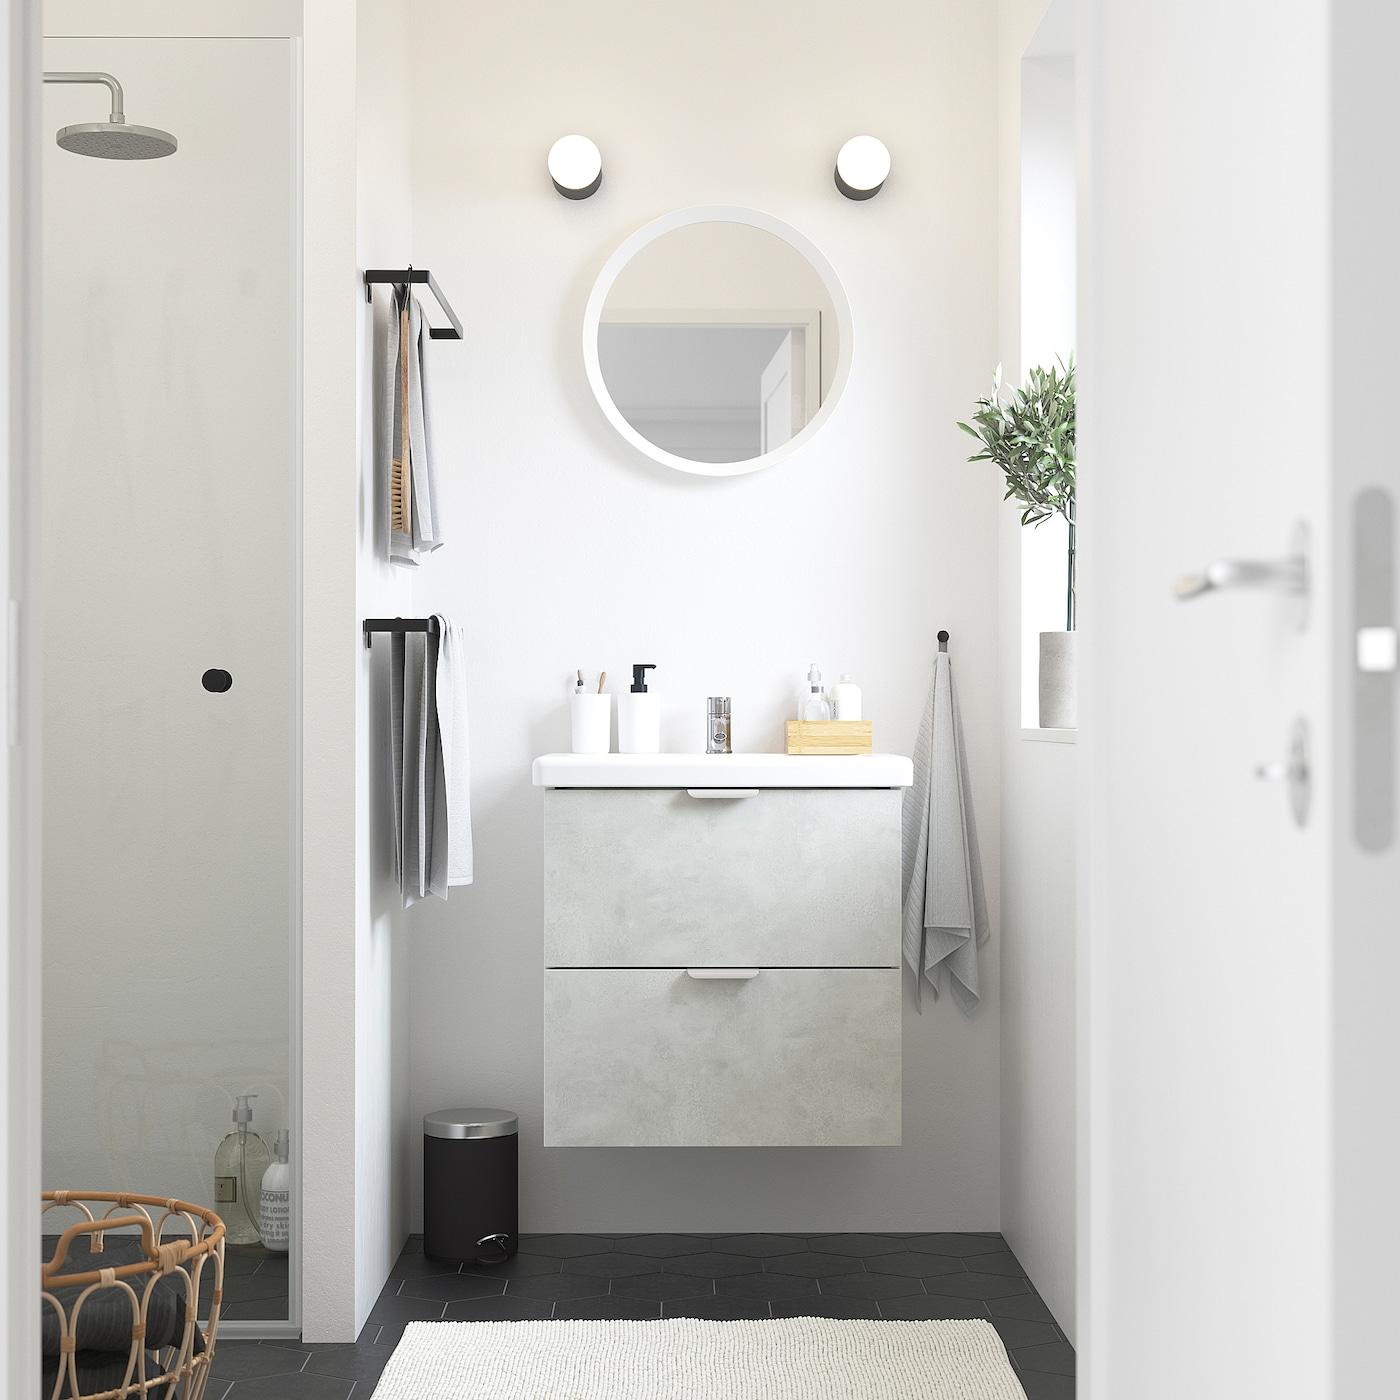 ENHET / TVÄLLEN Wash-stand with 2 drawers, concrete effect/white Pilkån tap, 64x43x65 cm